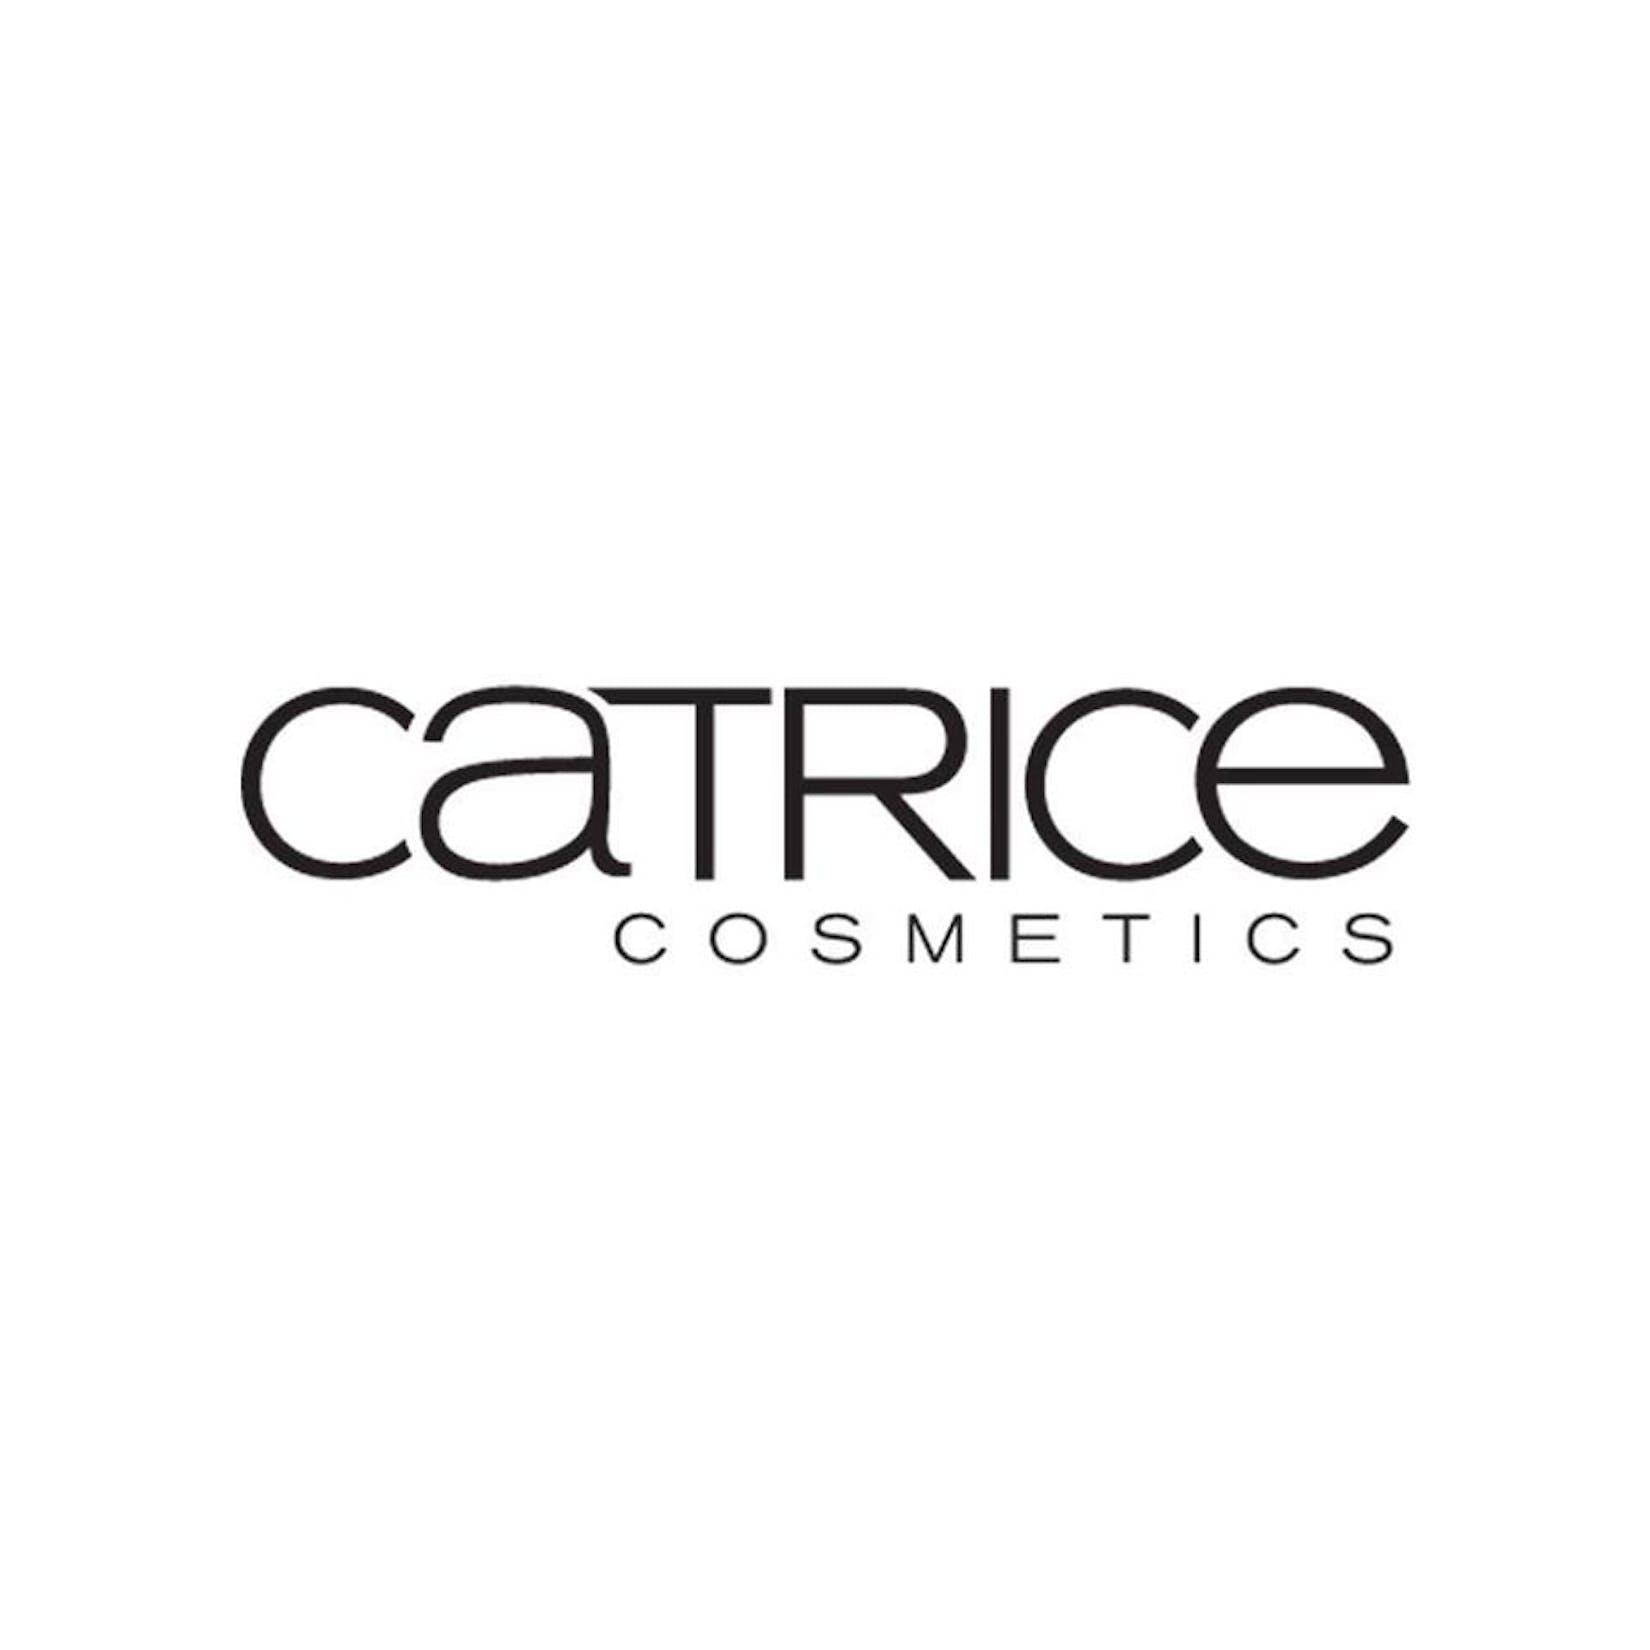 Catrice Cosmetics | Beauty